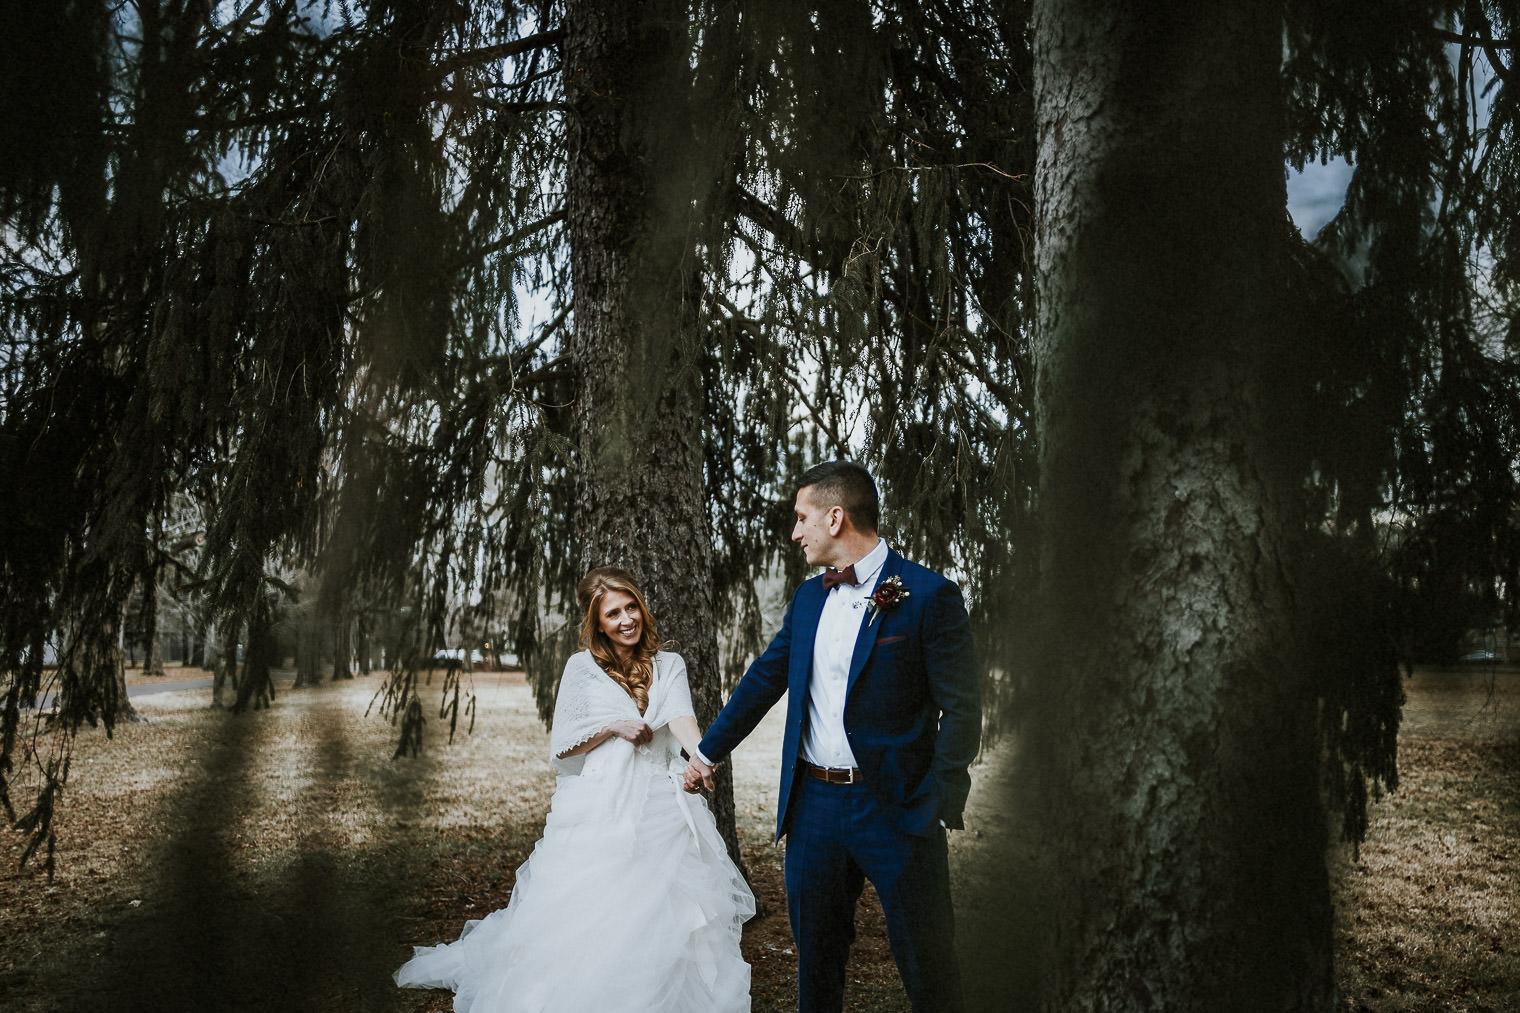 Jay-Cassario-Leica-Wedding-31.jpg